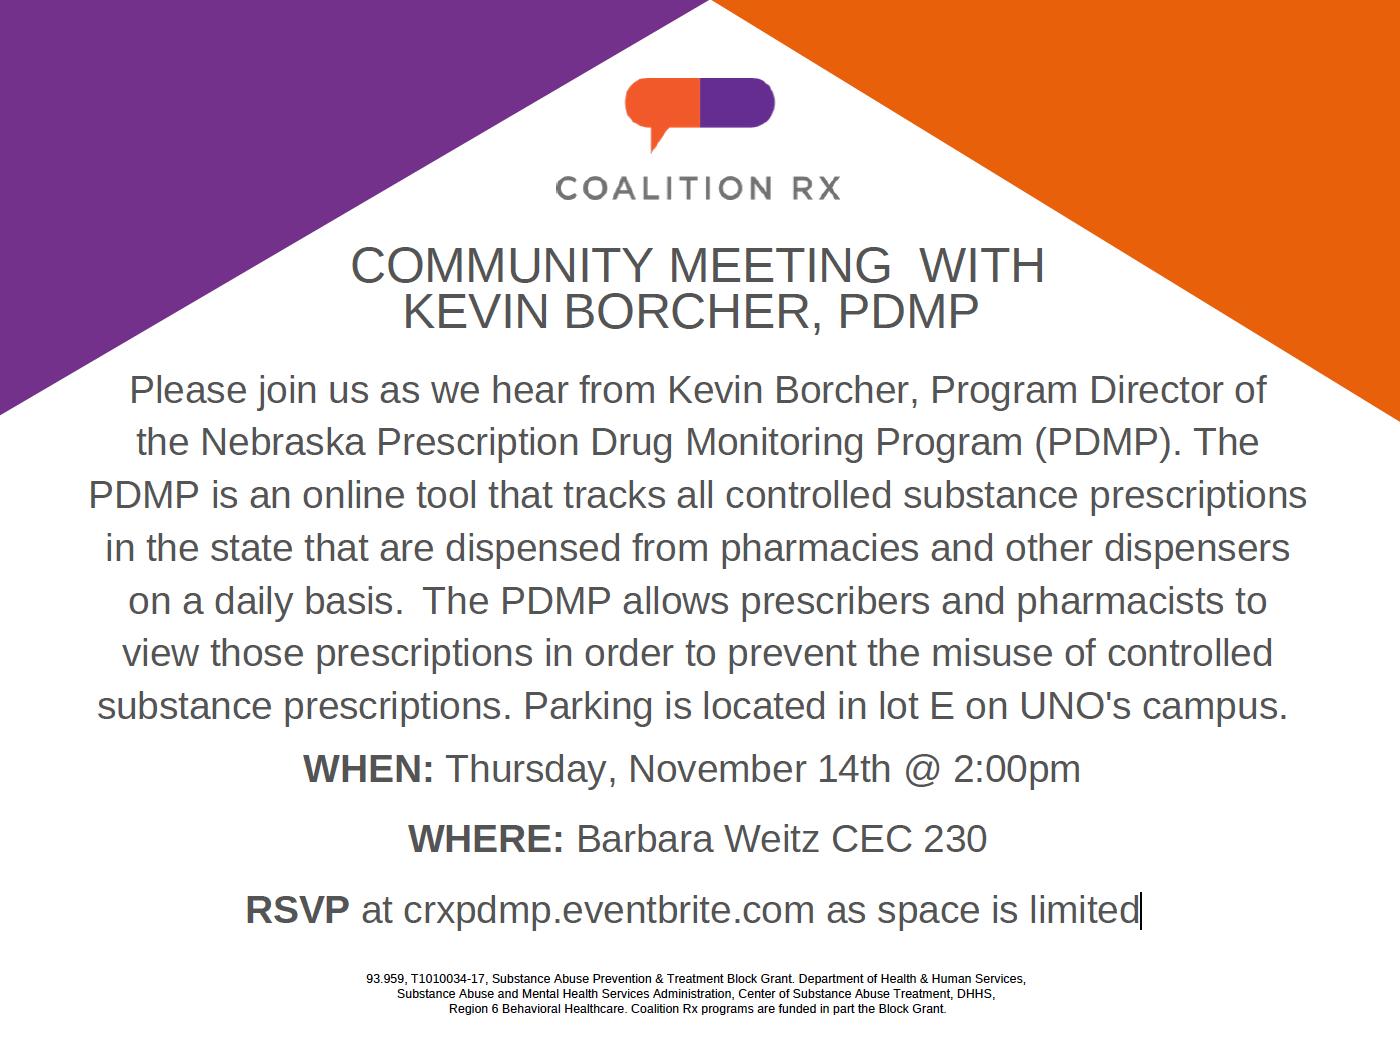 Community Meeting about the Prescription Drug Monitoring Program